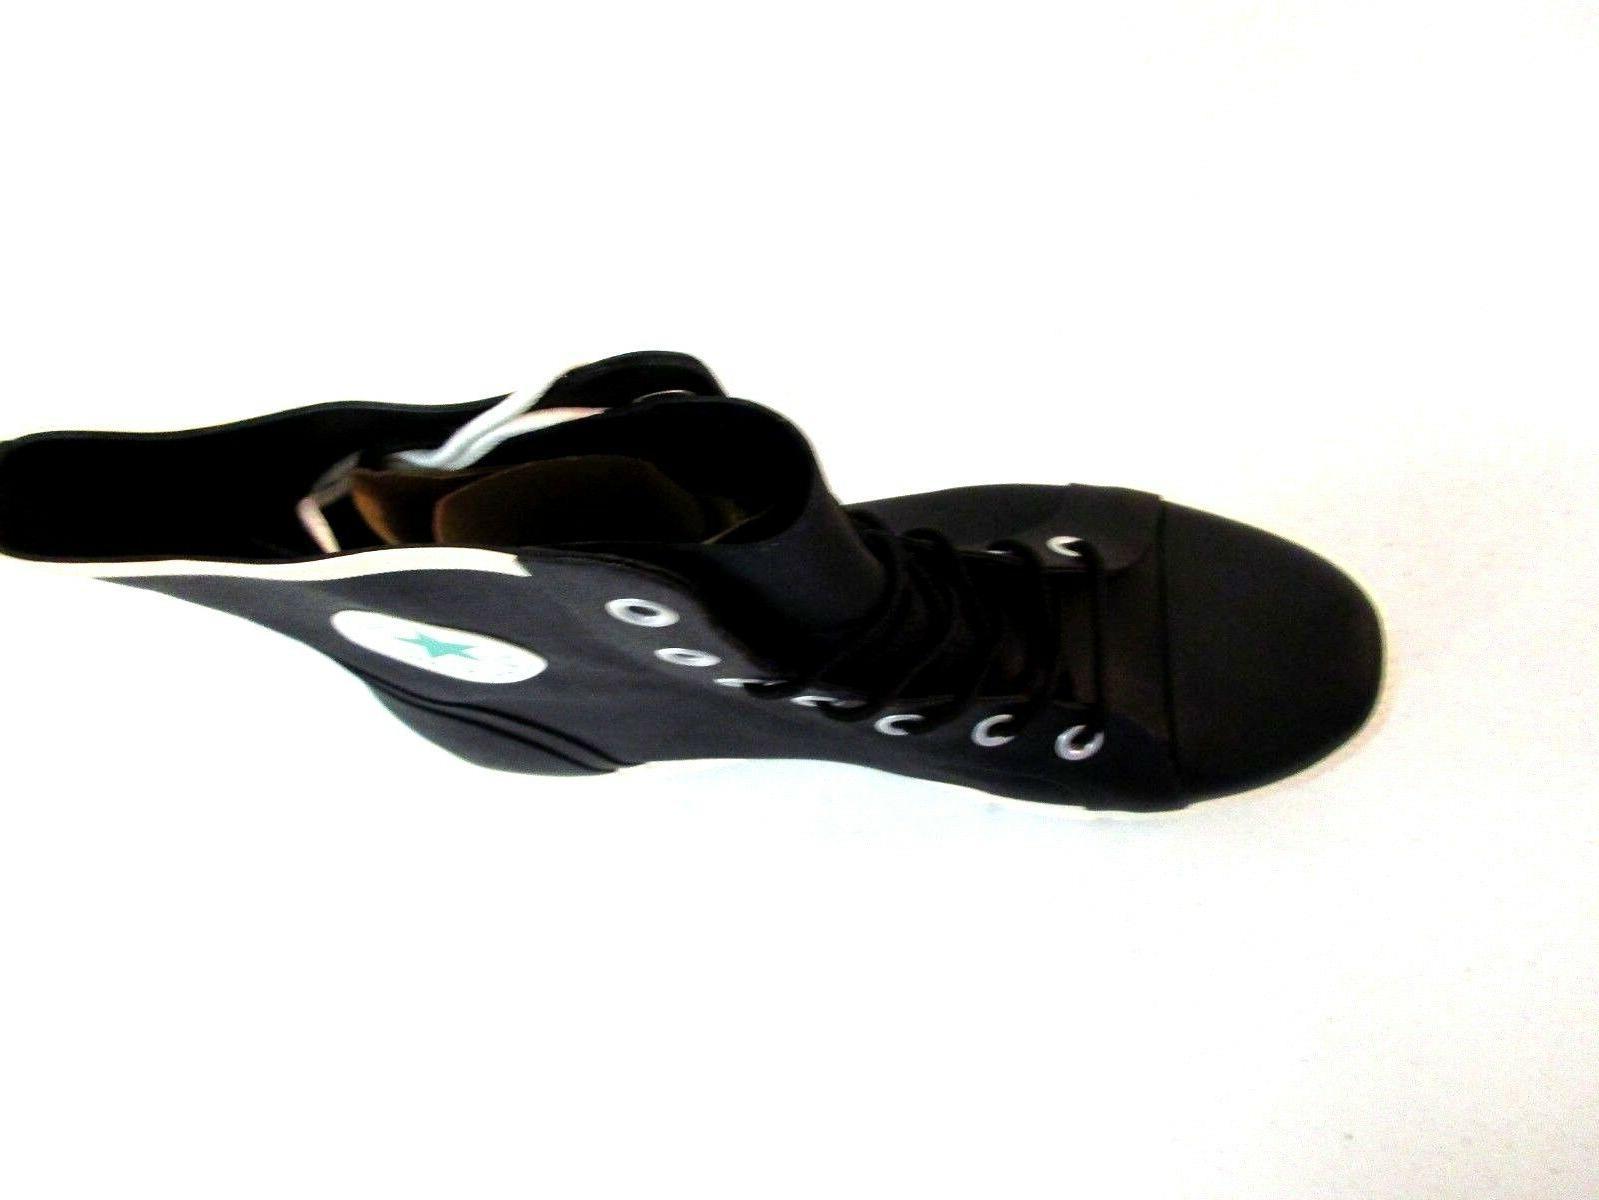 Converse Boot Black Boots 111153